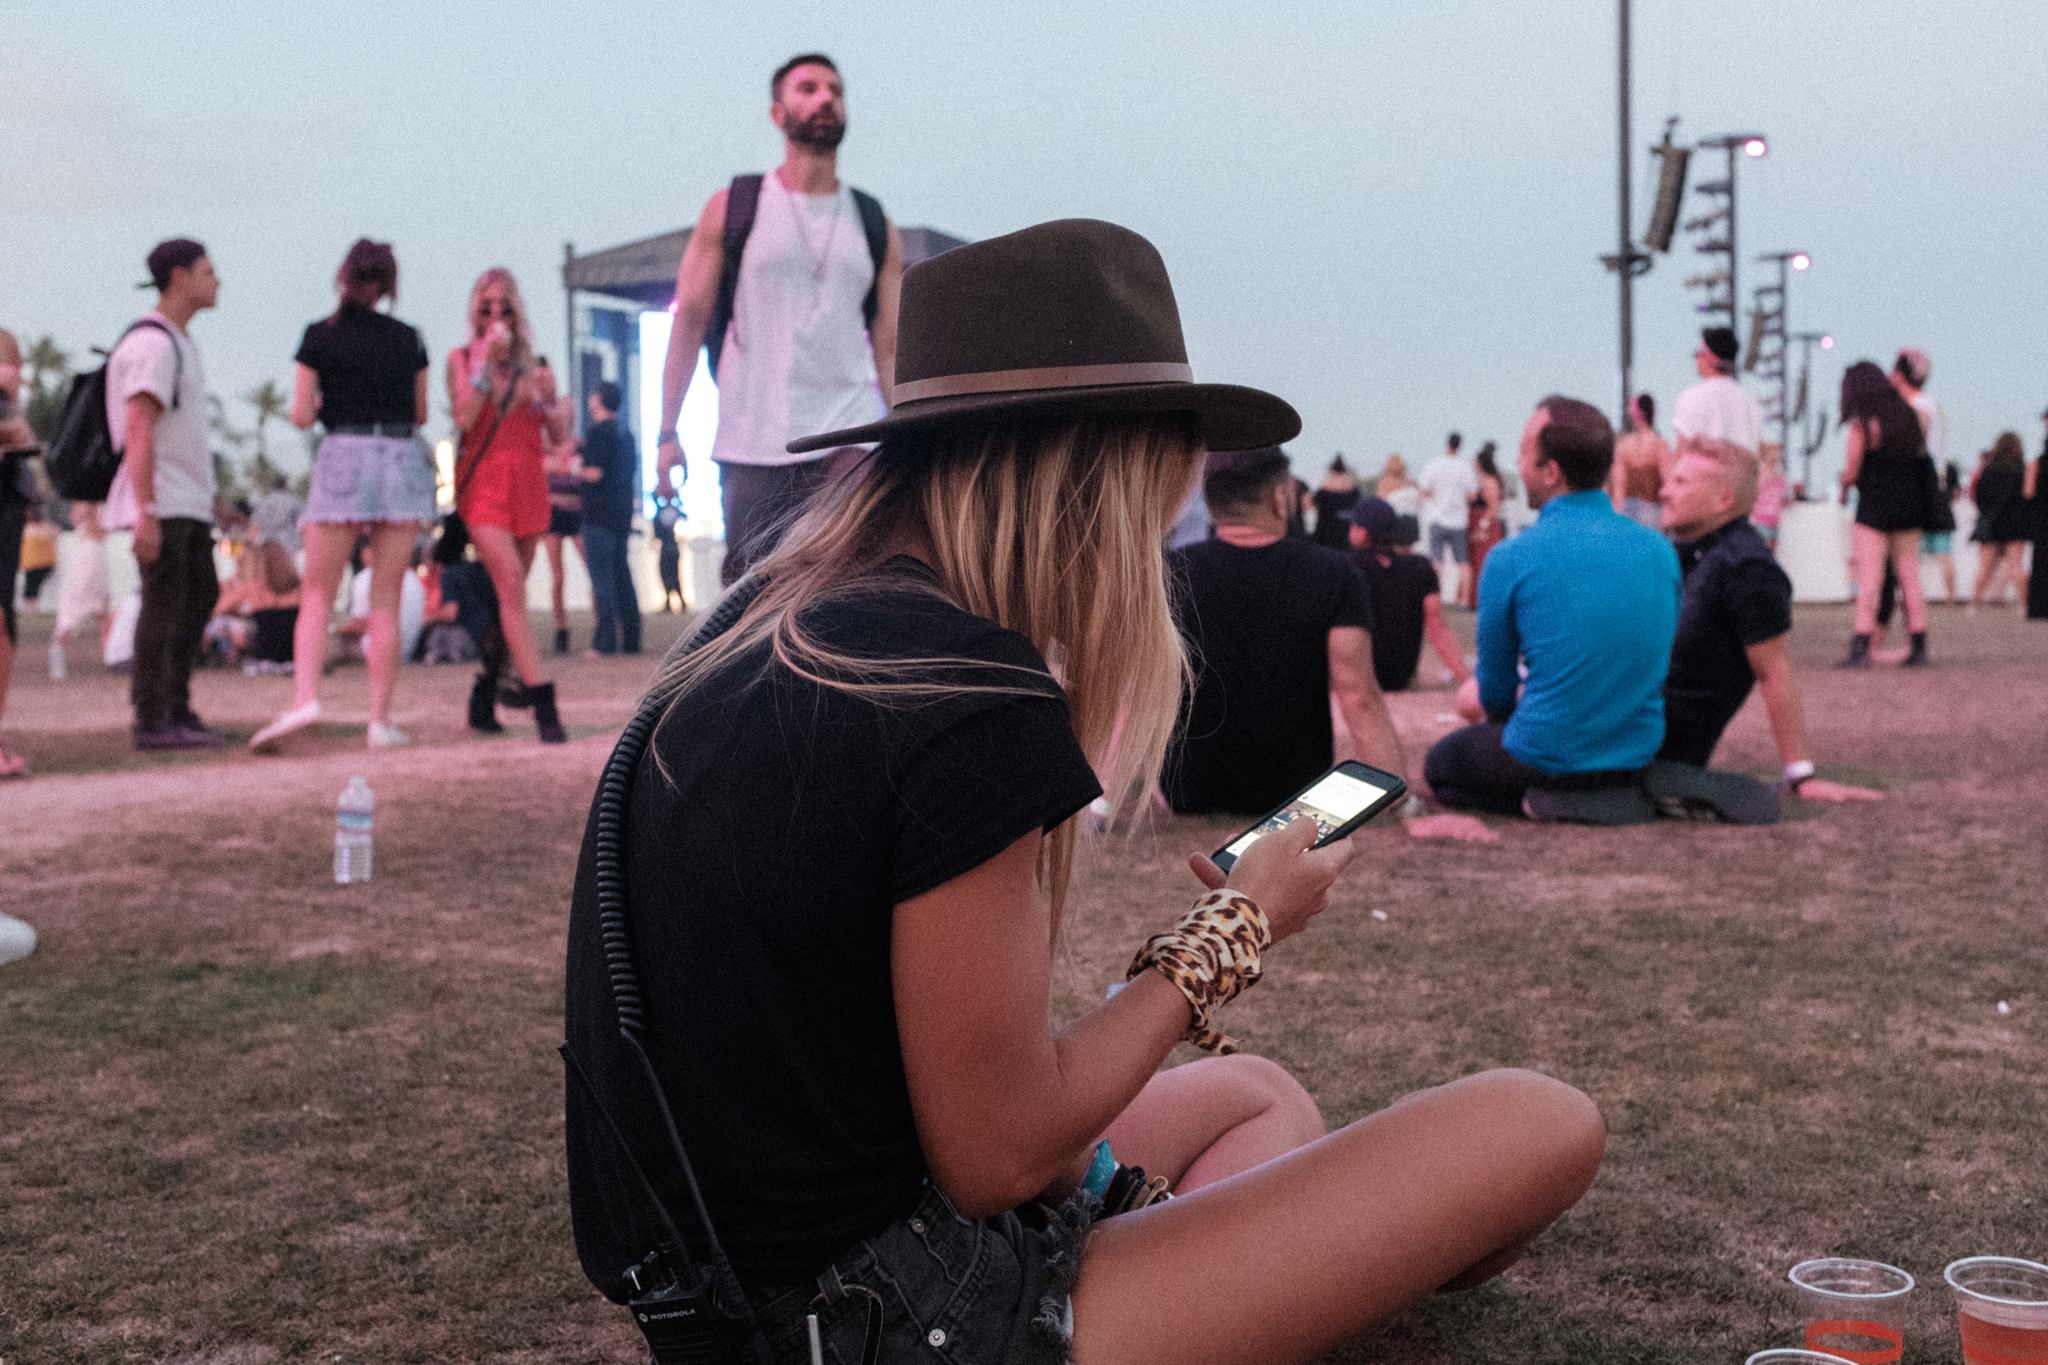 170423 Coachella 17 w2 2074.jpg